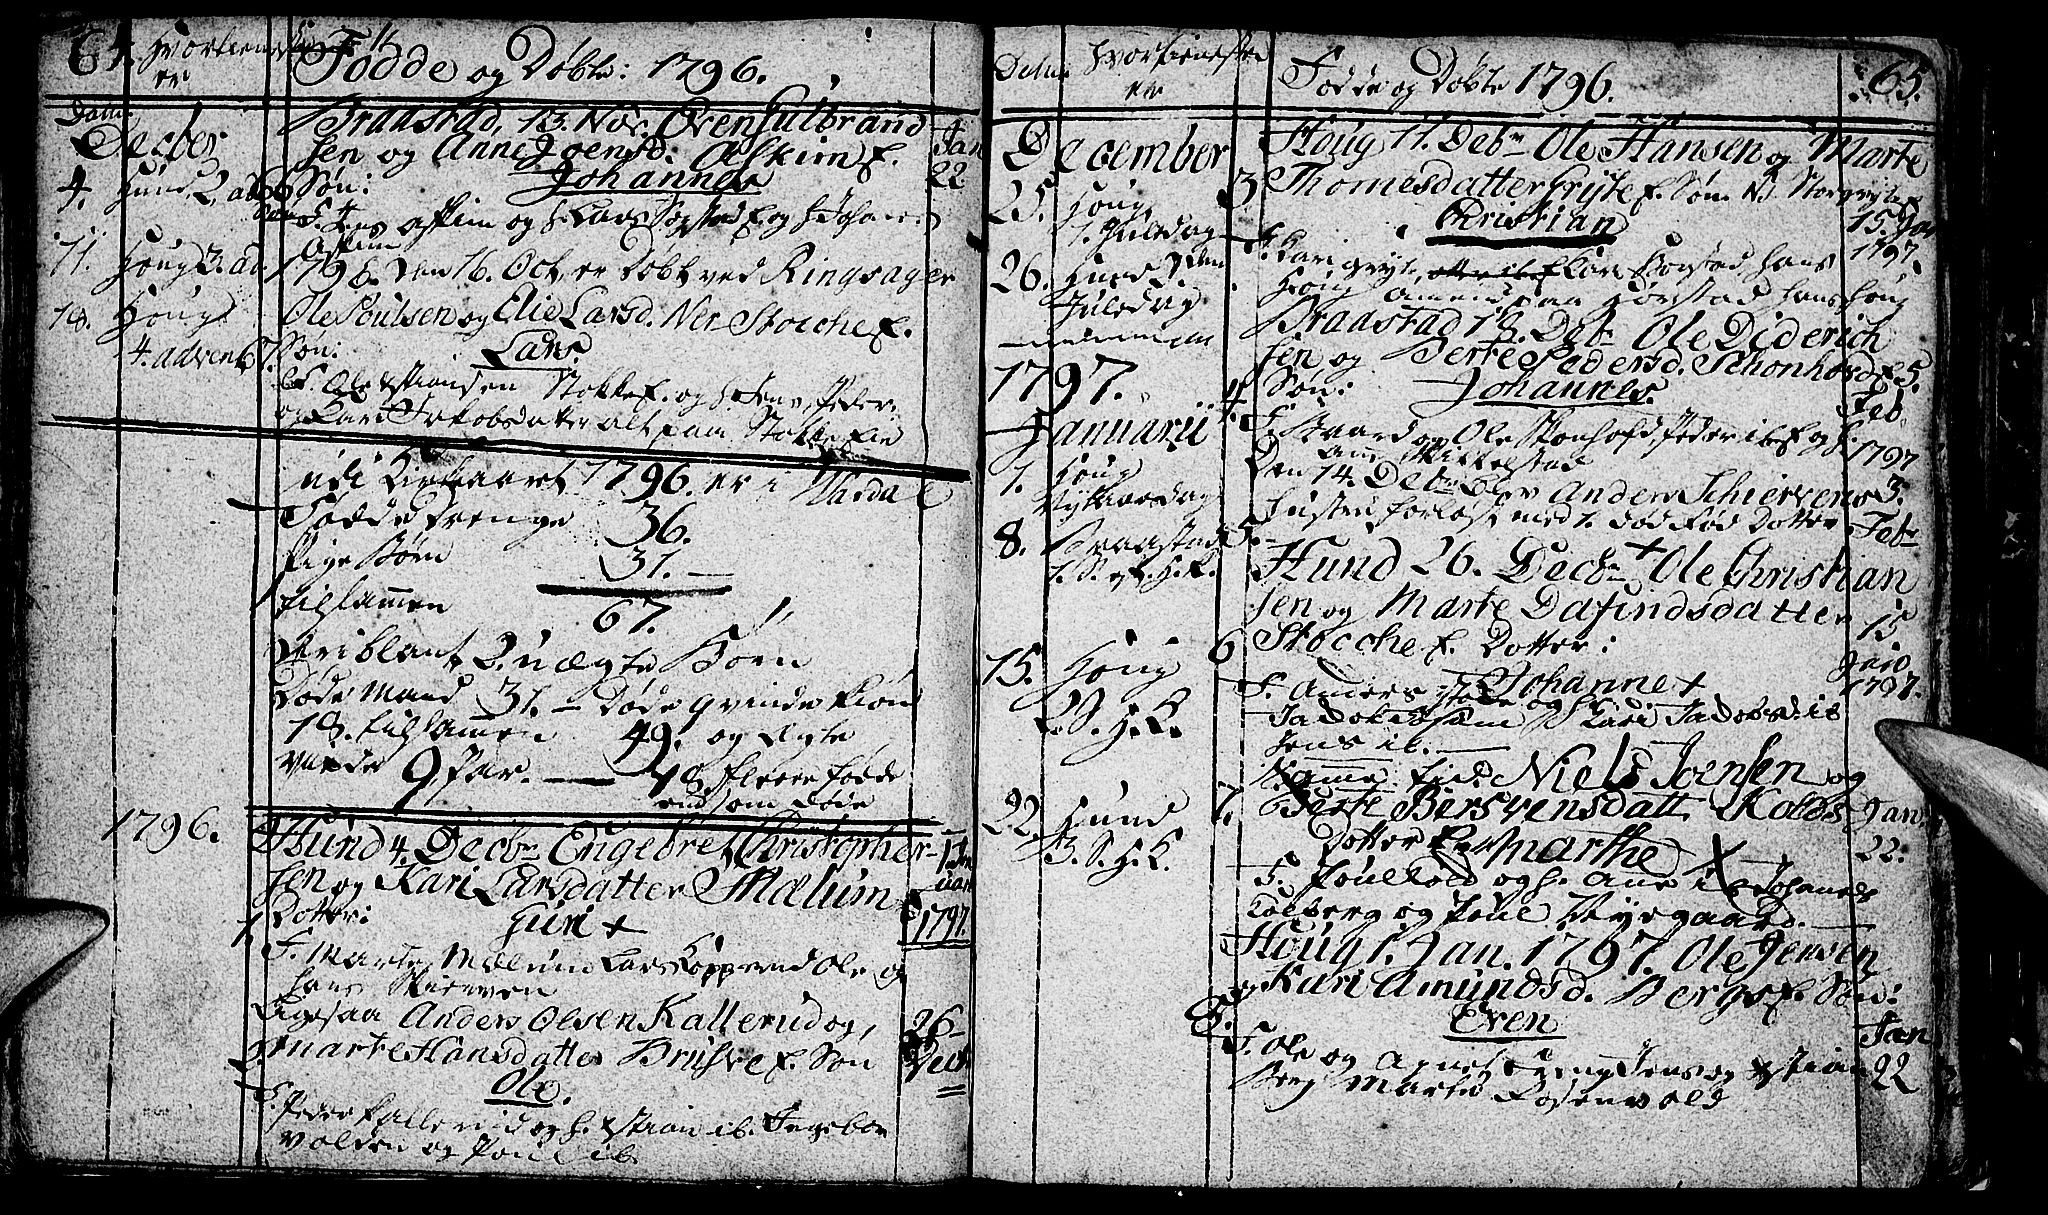 SAH, Vardal prestekontor, H/Ha/Hab/L0002: Klokkerbok nr. 2, 1790-1803, s. 64-65